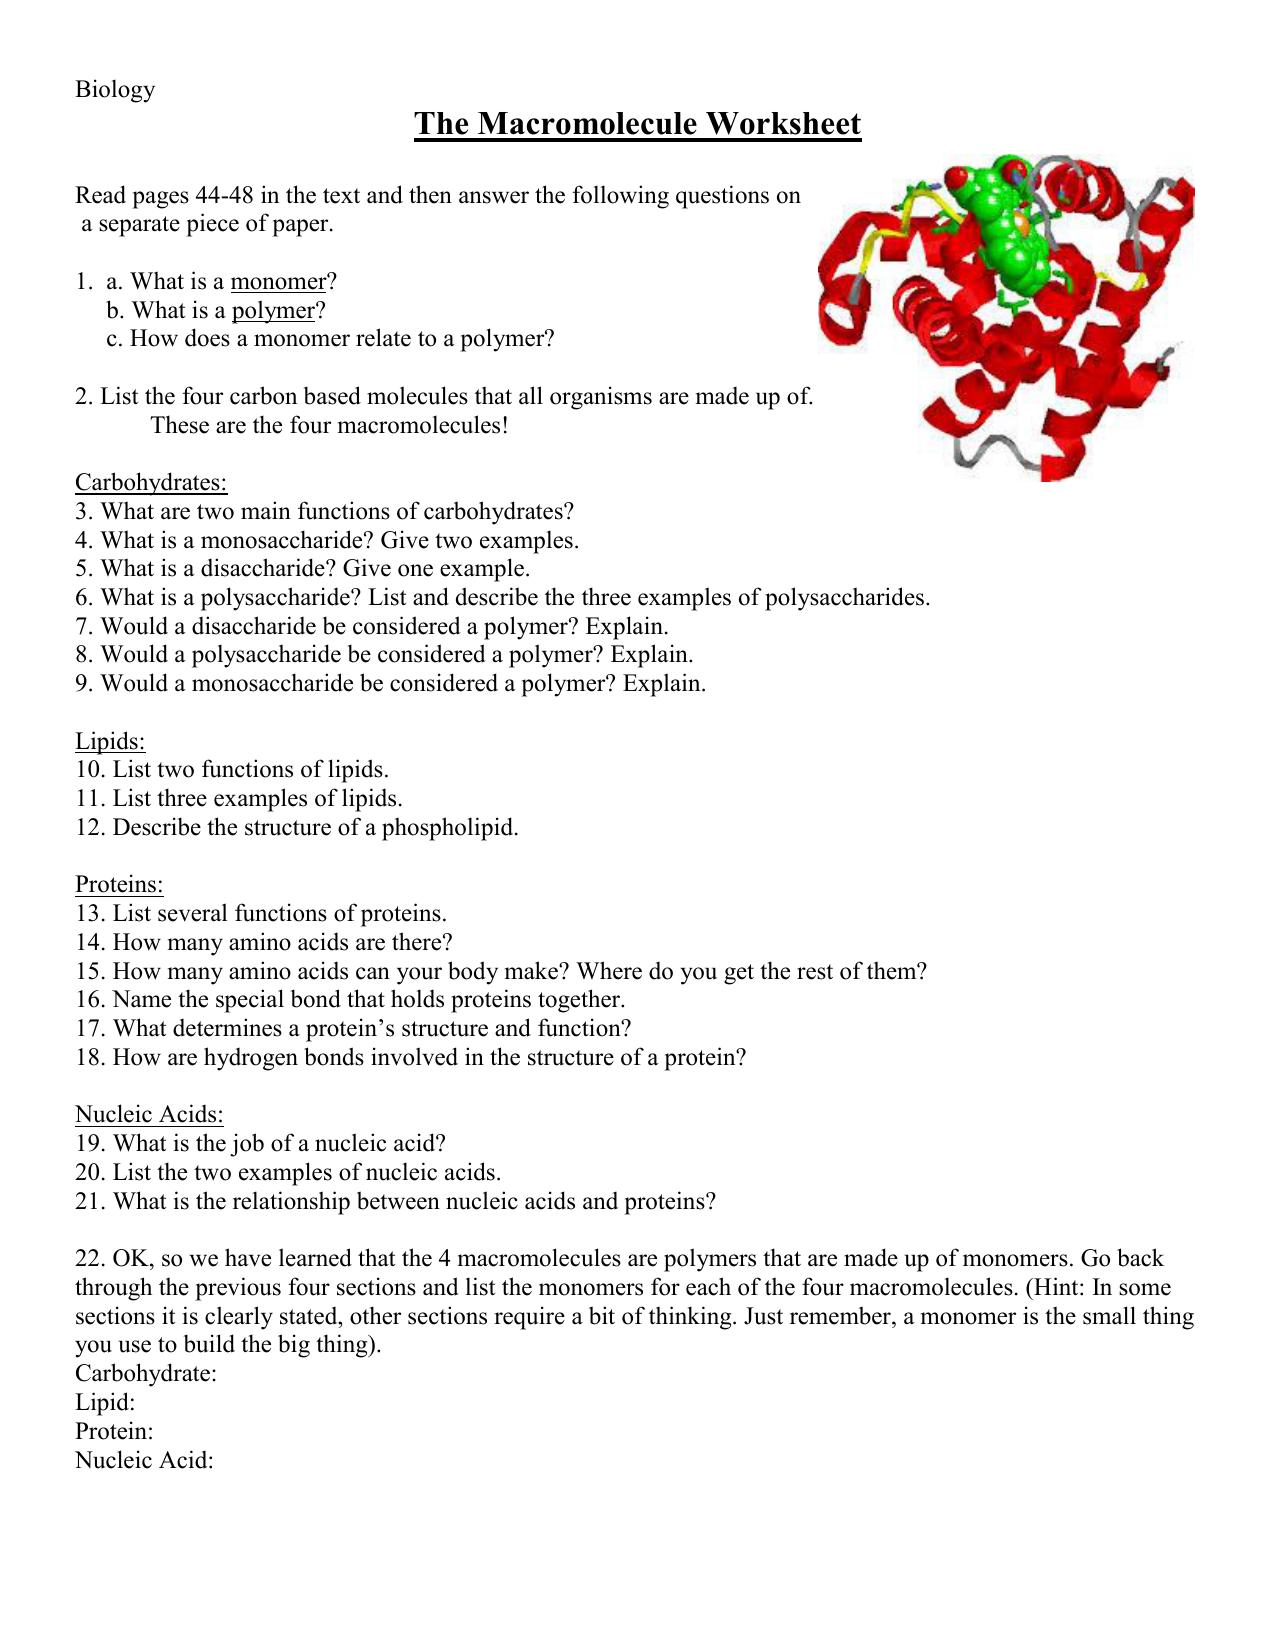 Worksheets Macromolecules Worksheet the macromolecule worksheet 014401035 1 5b3439c96e5e93f5e8135128e4e39b01 png